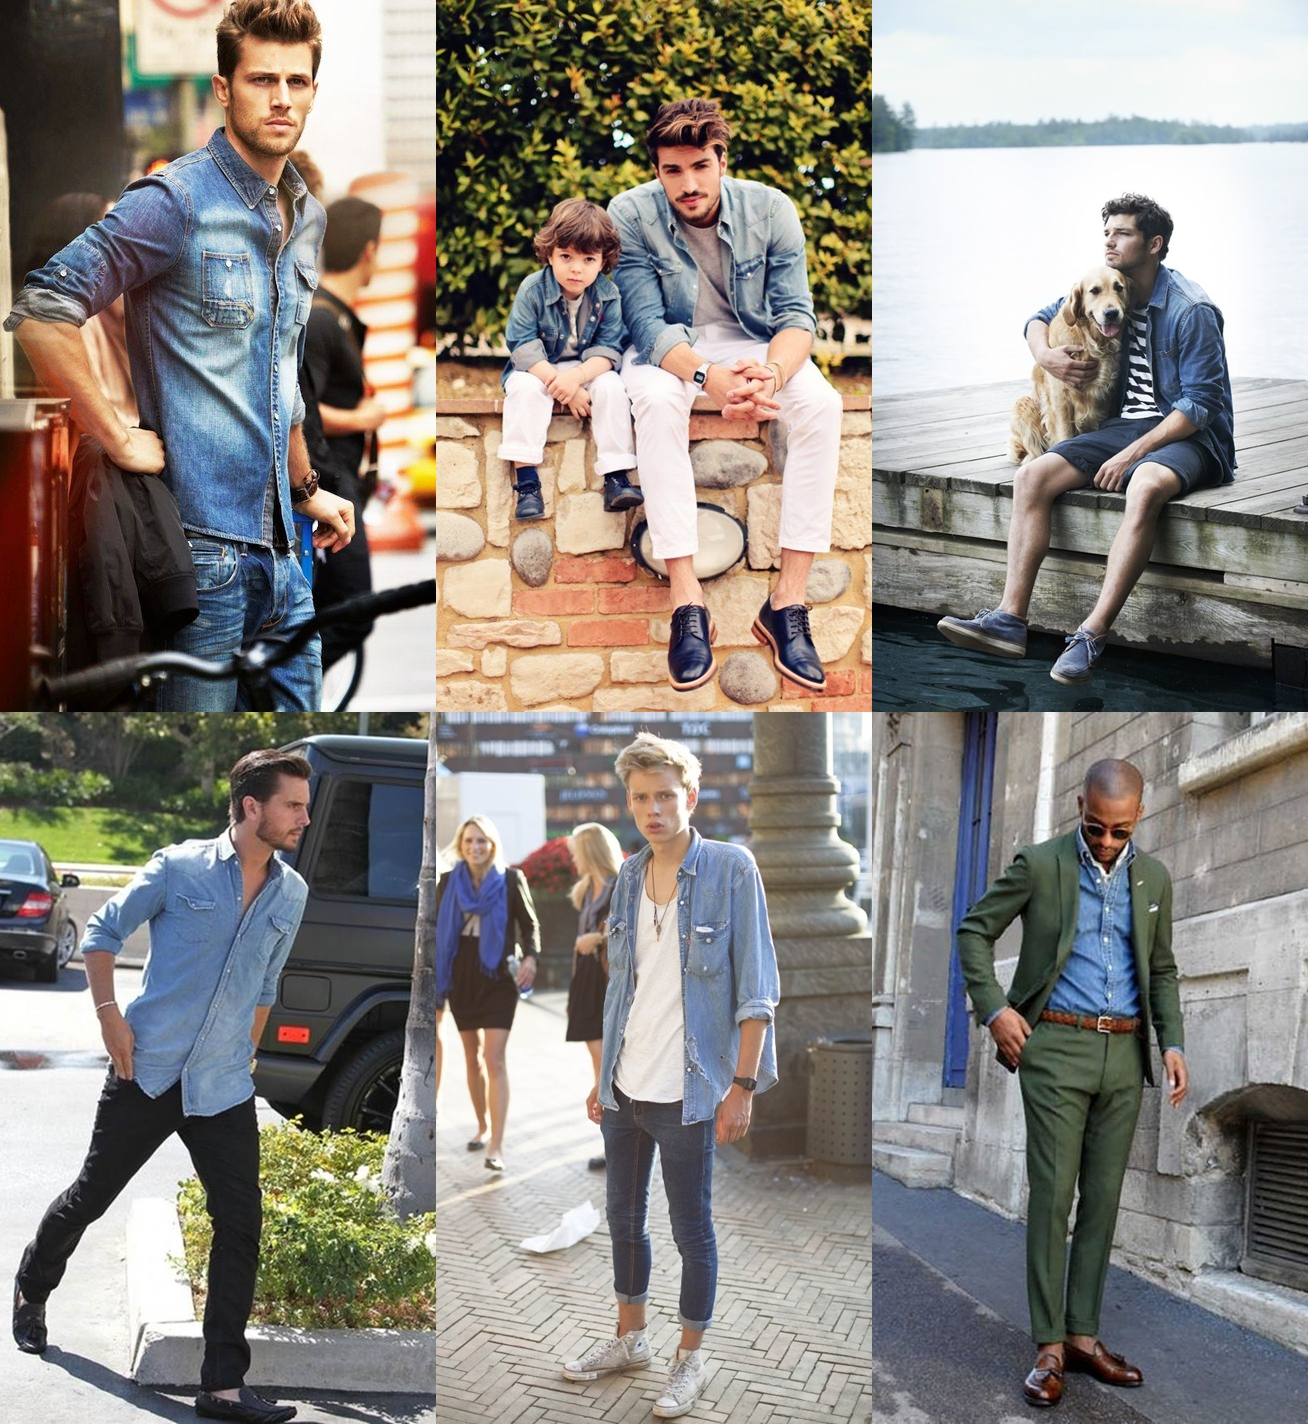 camisa jeans masculino, camisa jeans, moda masculina, moda 2016, tendencia 2016, menswear, style, estilo, alex cursino, moda sem censura, blog de moda, fashion blogger, fashion tips, 3